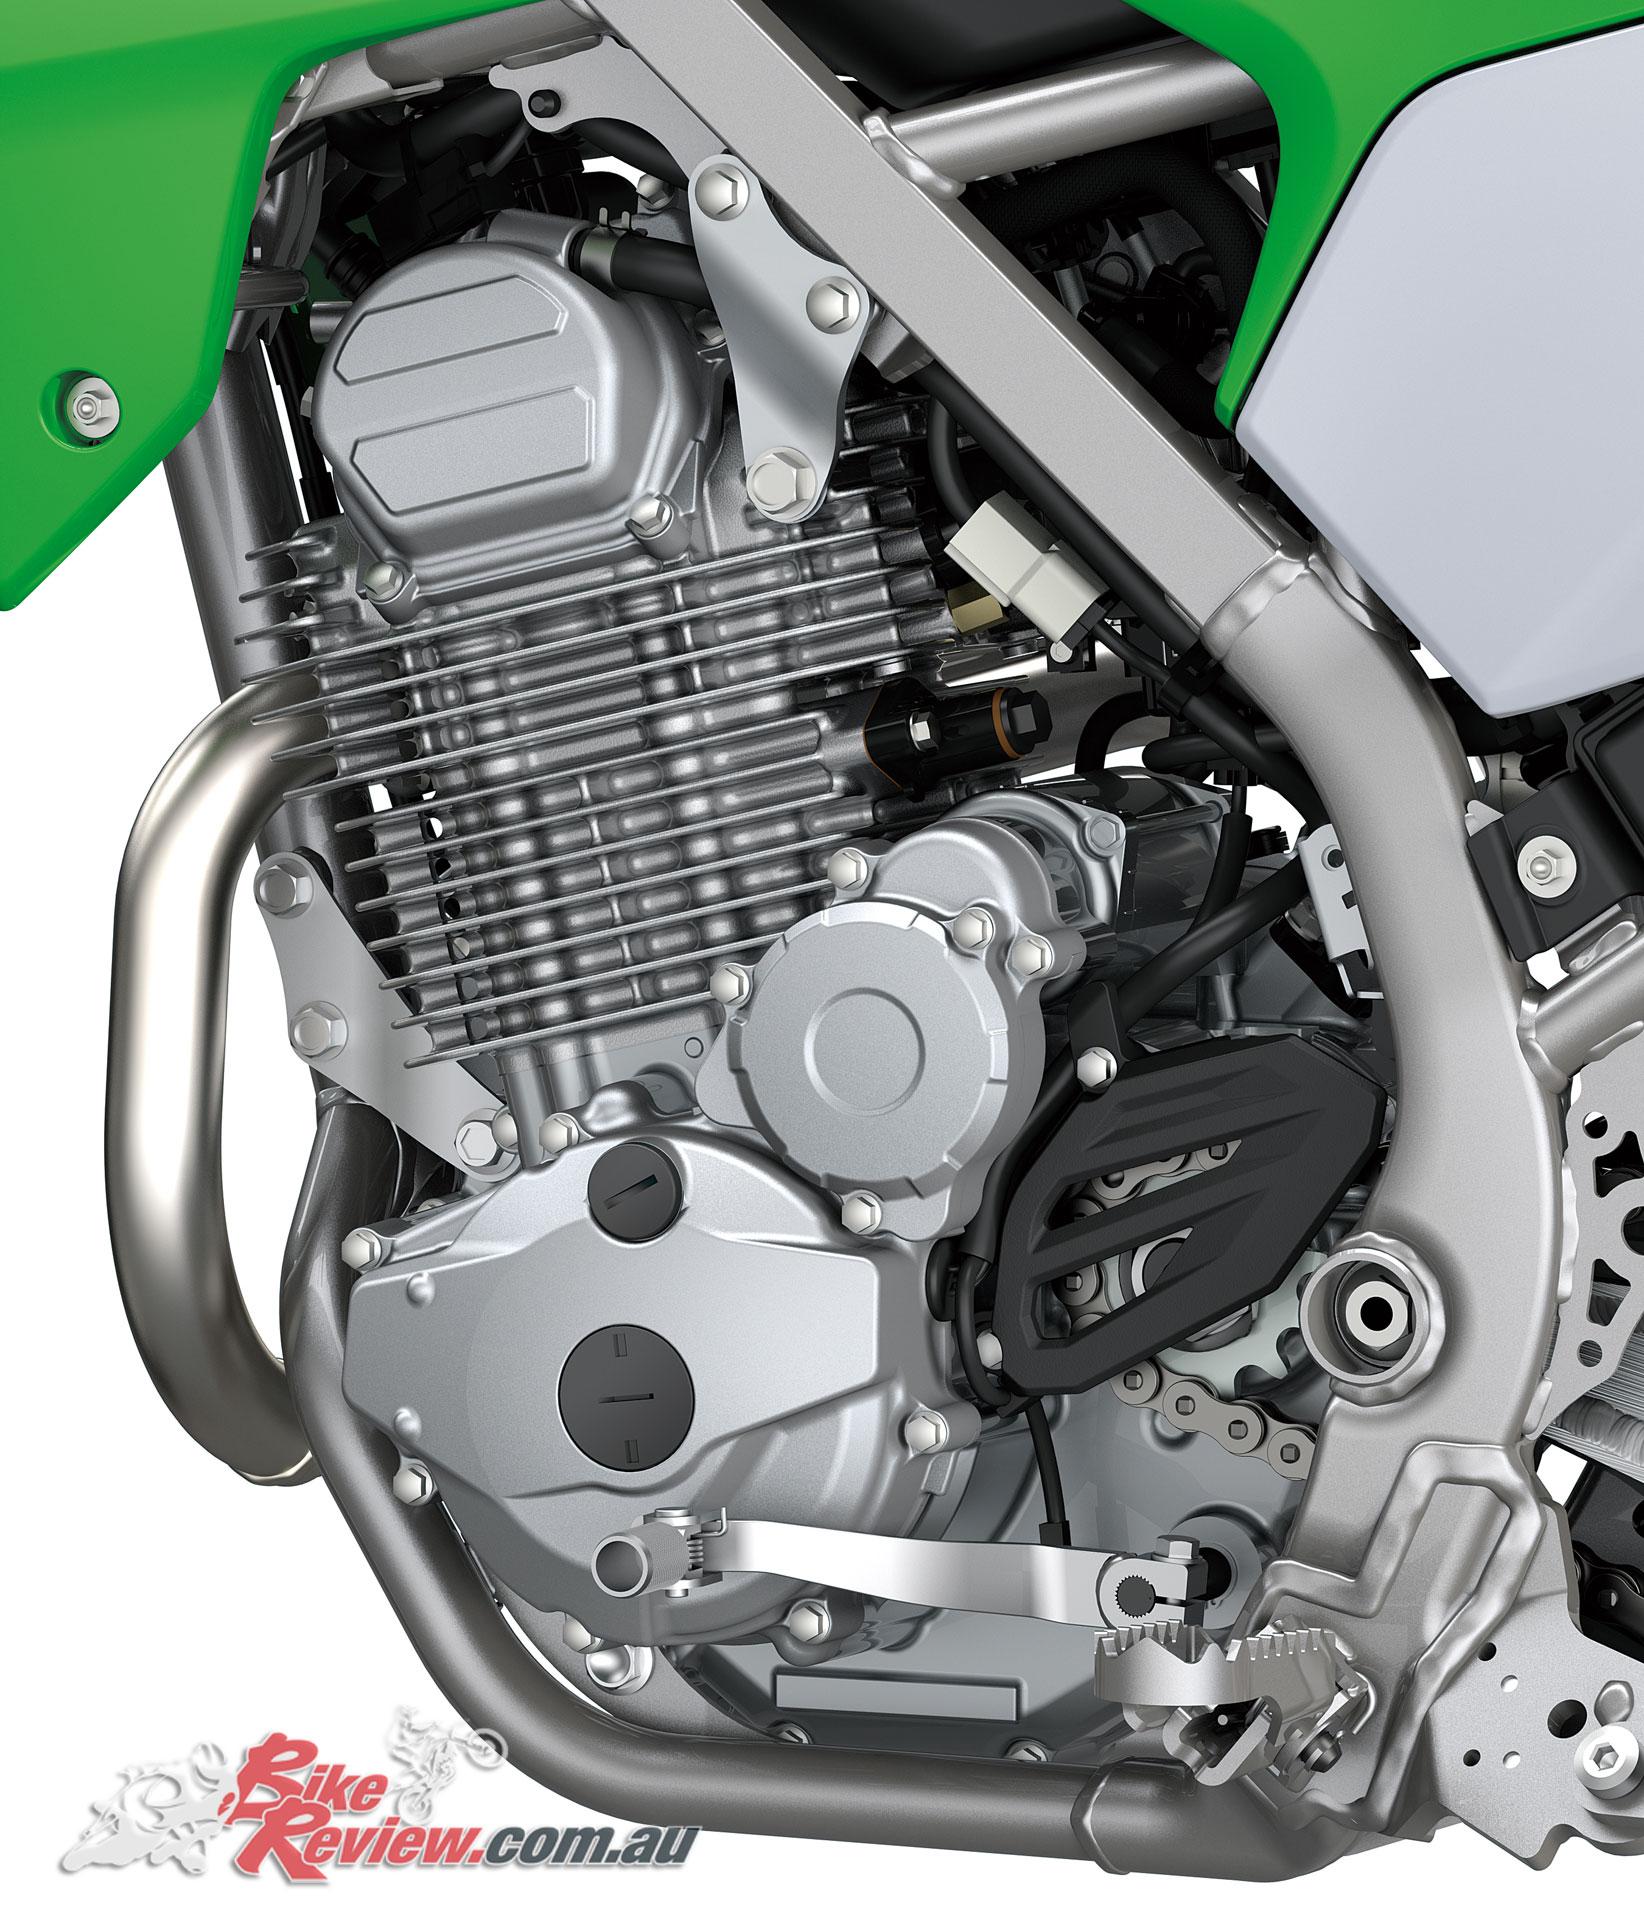 2020 Kawasaki KLX230R powerplant